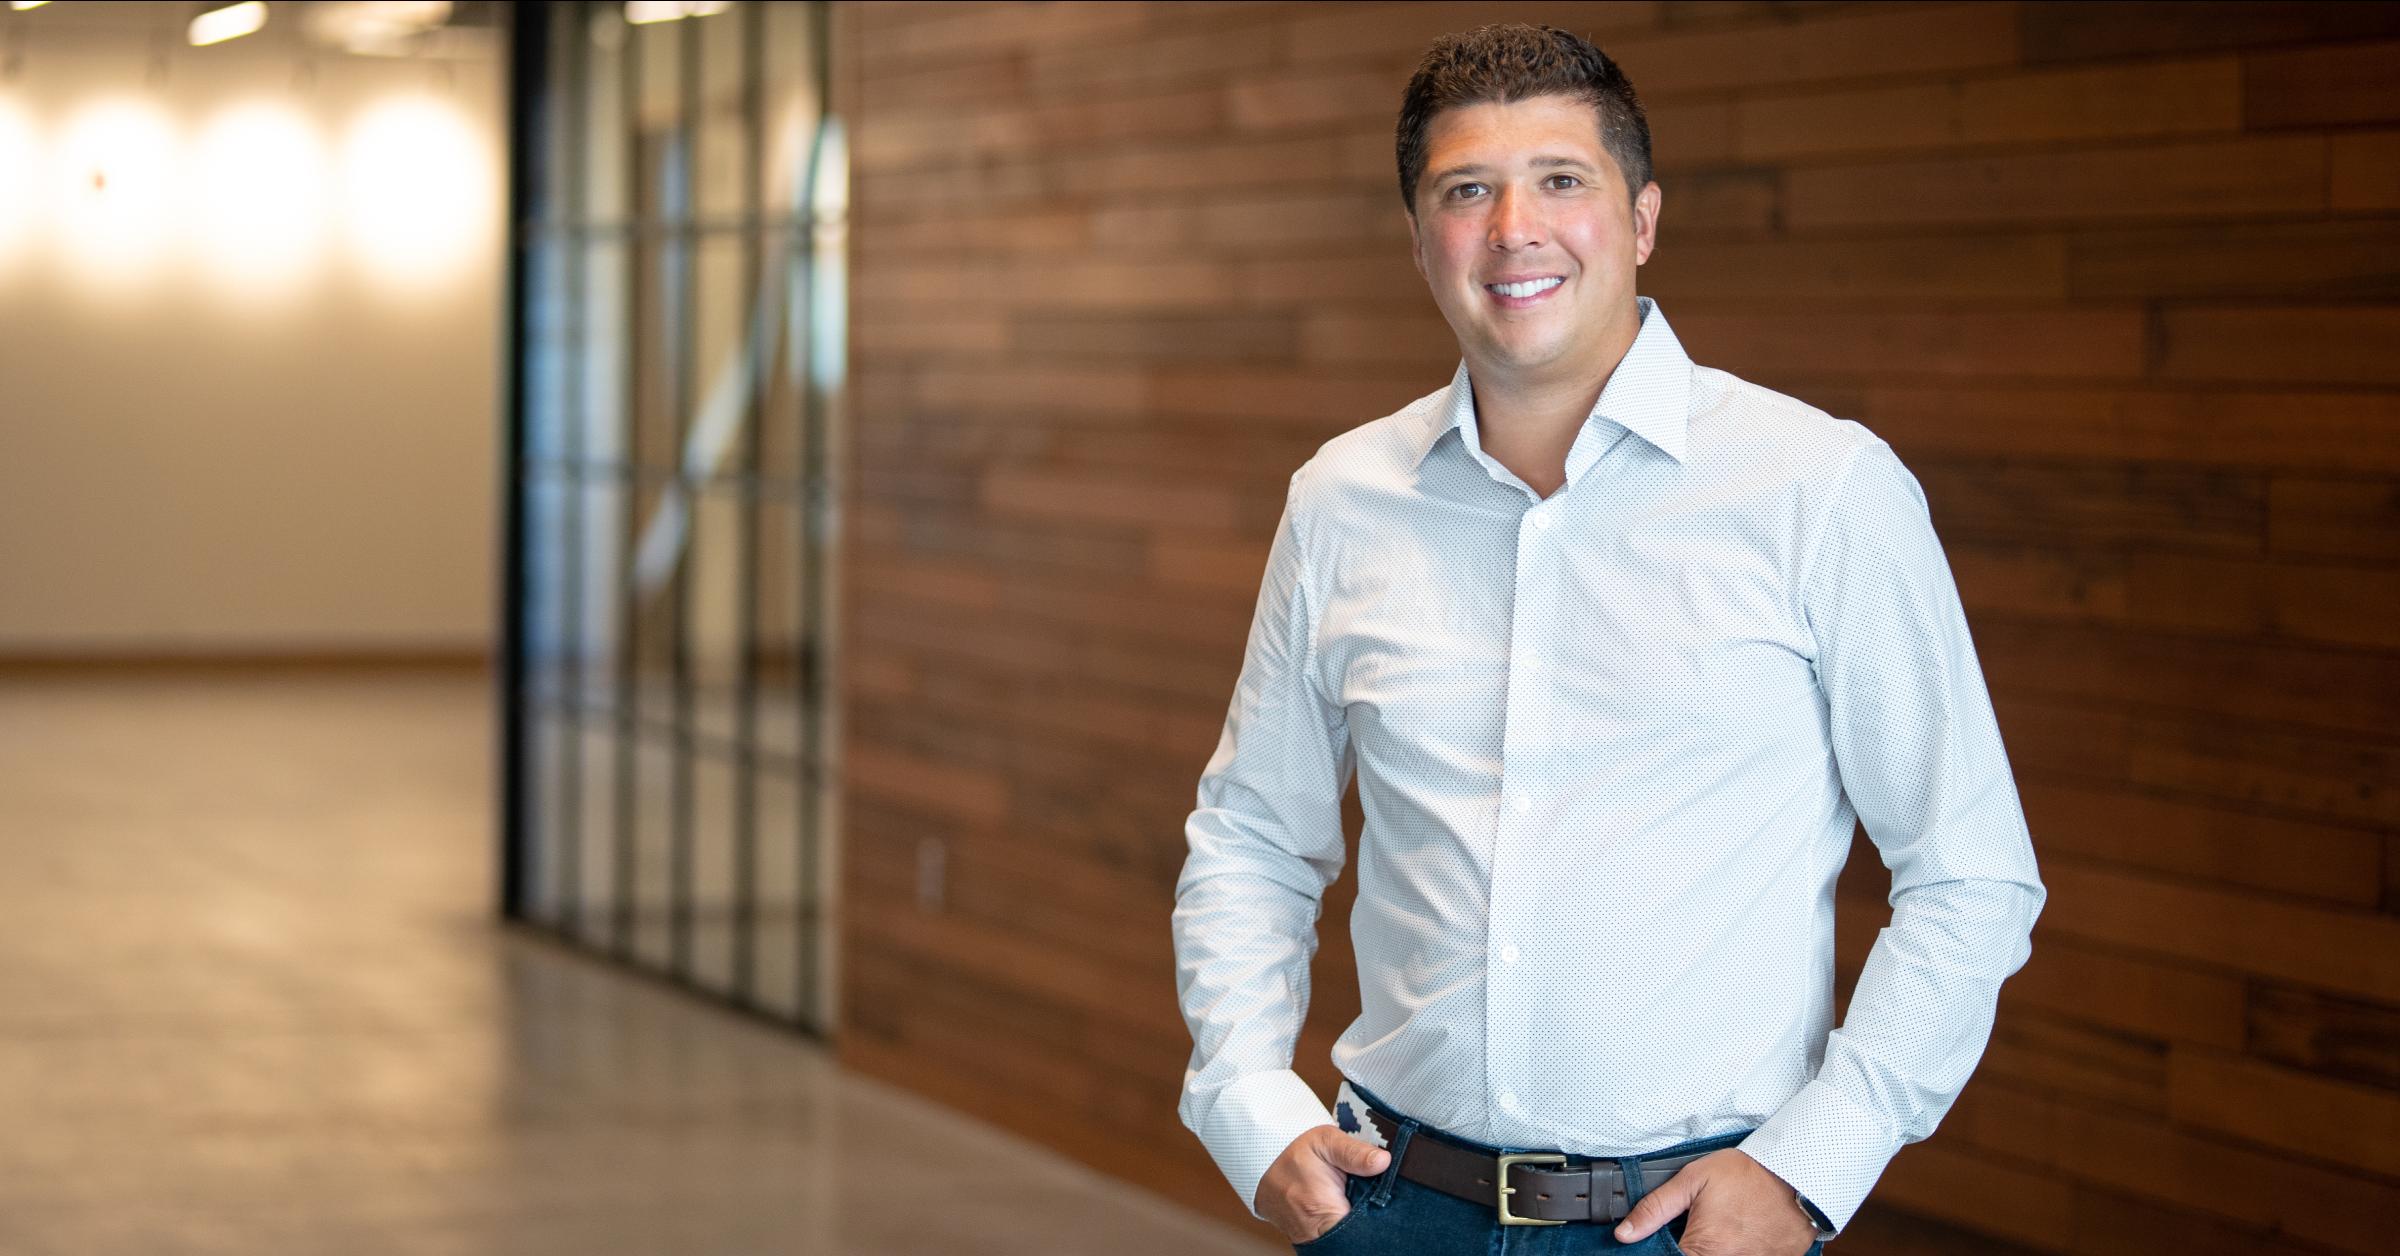 New Breed CEO Patrick Biddiscombe